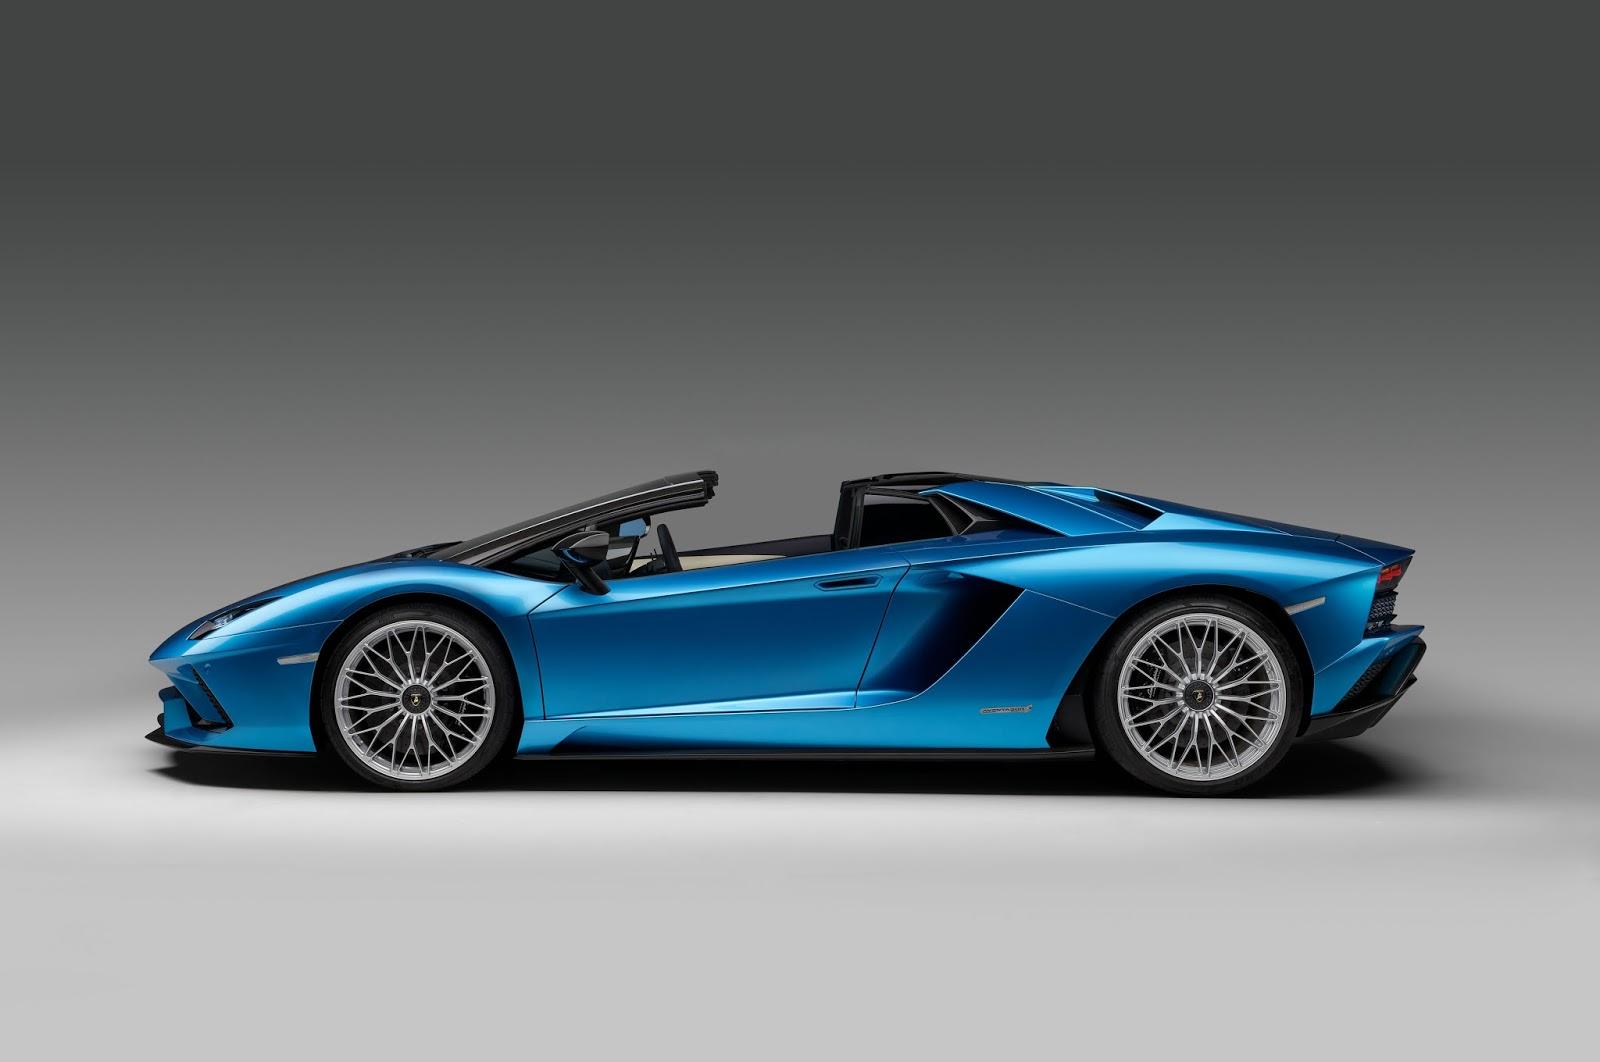 Lamborghini Has Chosen A First Choice Event To Introduce Its Last Model: Lamborghini  Aventador S Roadster At Last Frankfurt Auto Show.